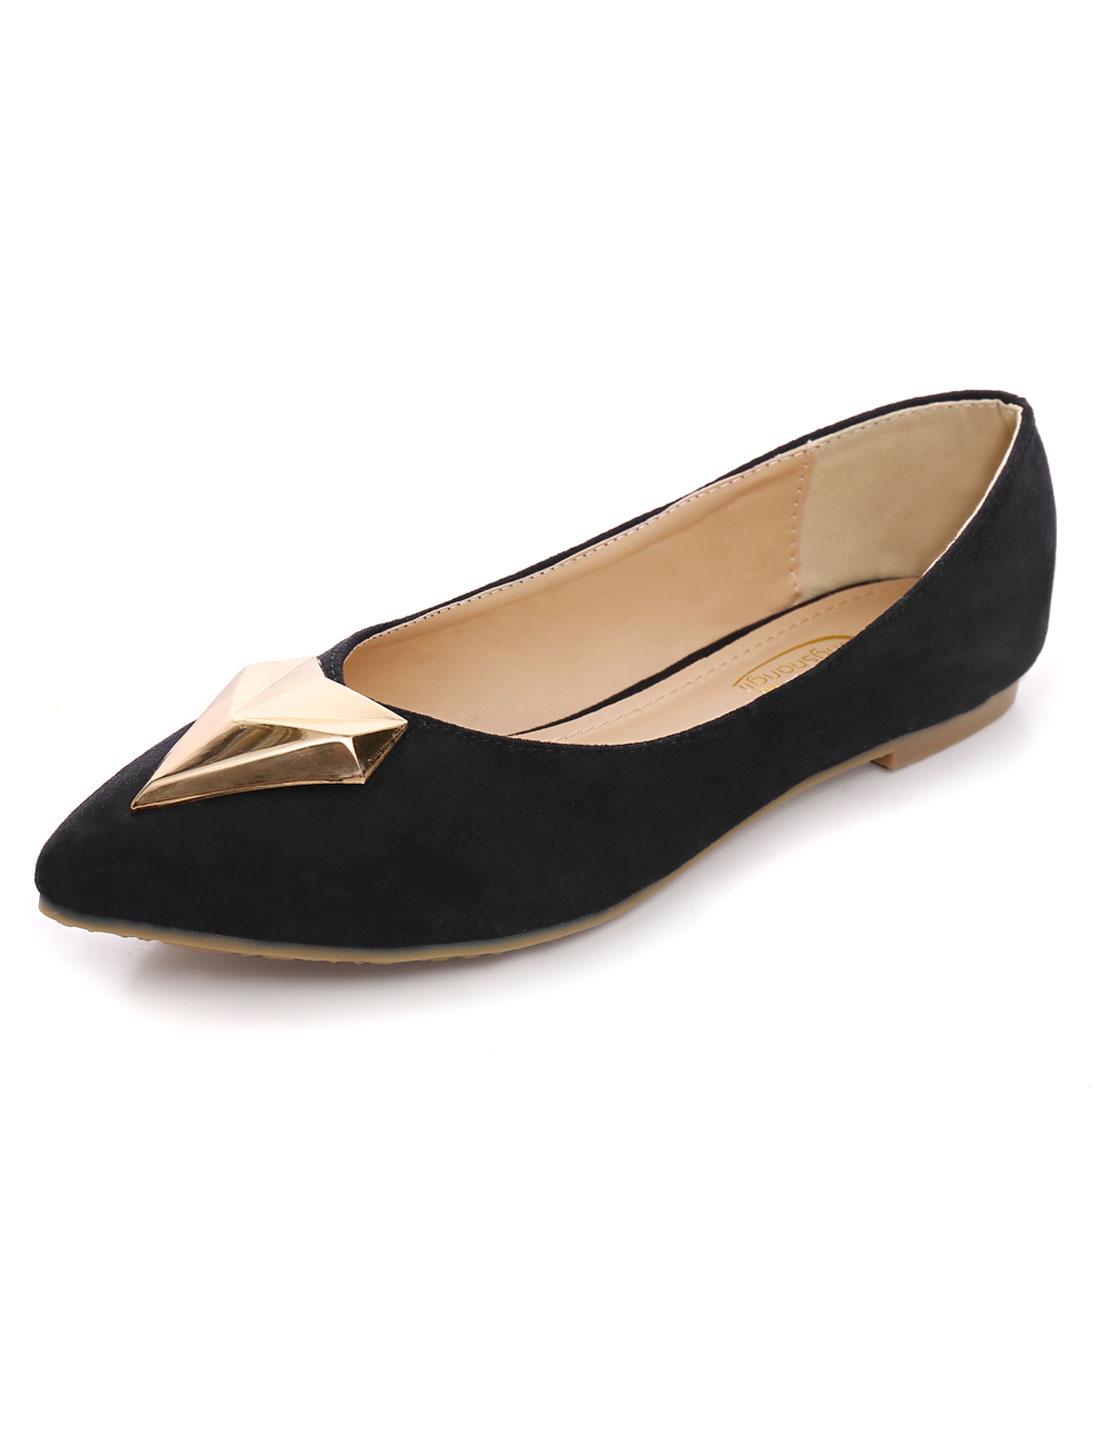 Lady Padded Insole Polished Plastic Decor Flats Shoes Coal Black US 9-9.5